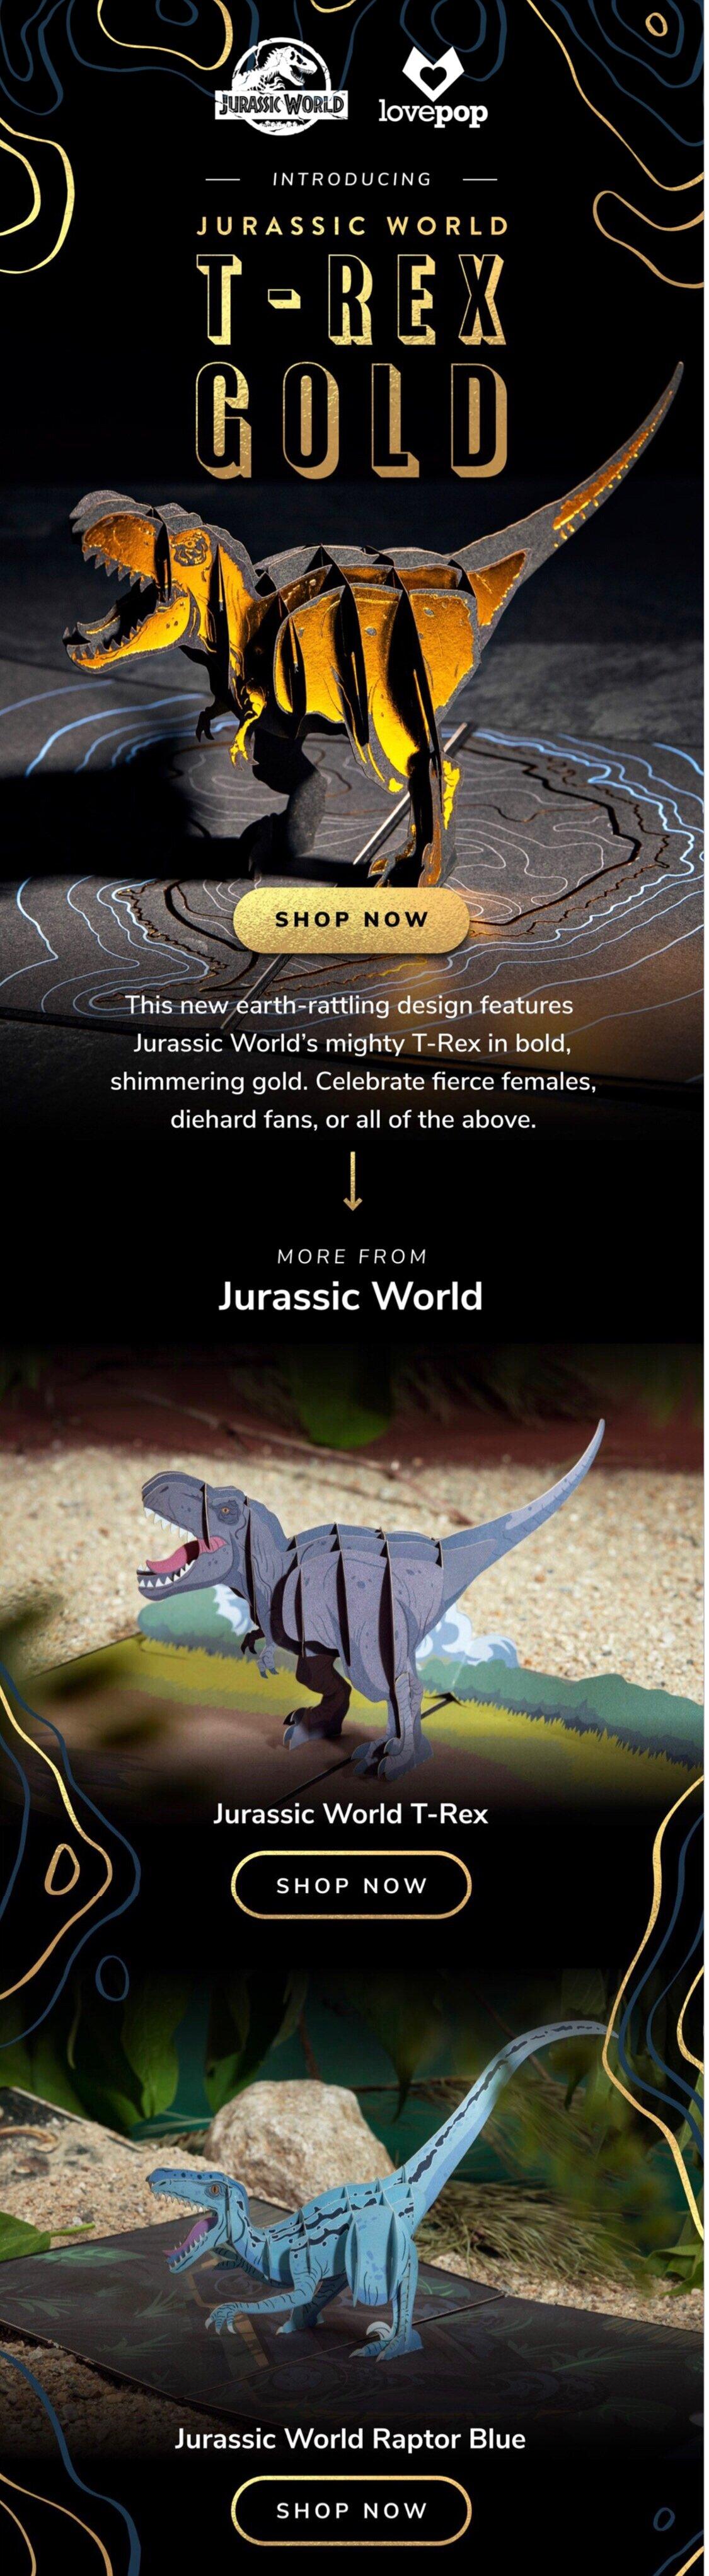 Lovepop Cards new design email launch:  Jurassic World